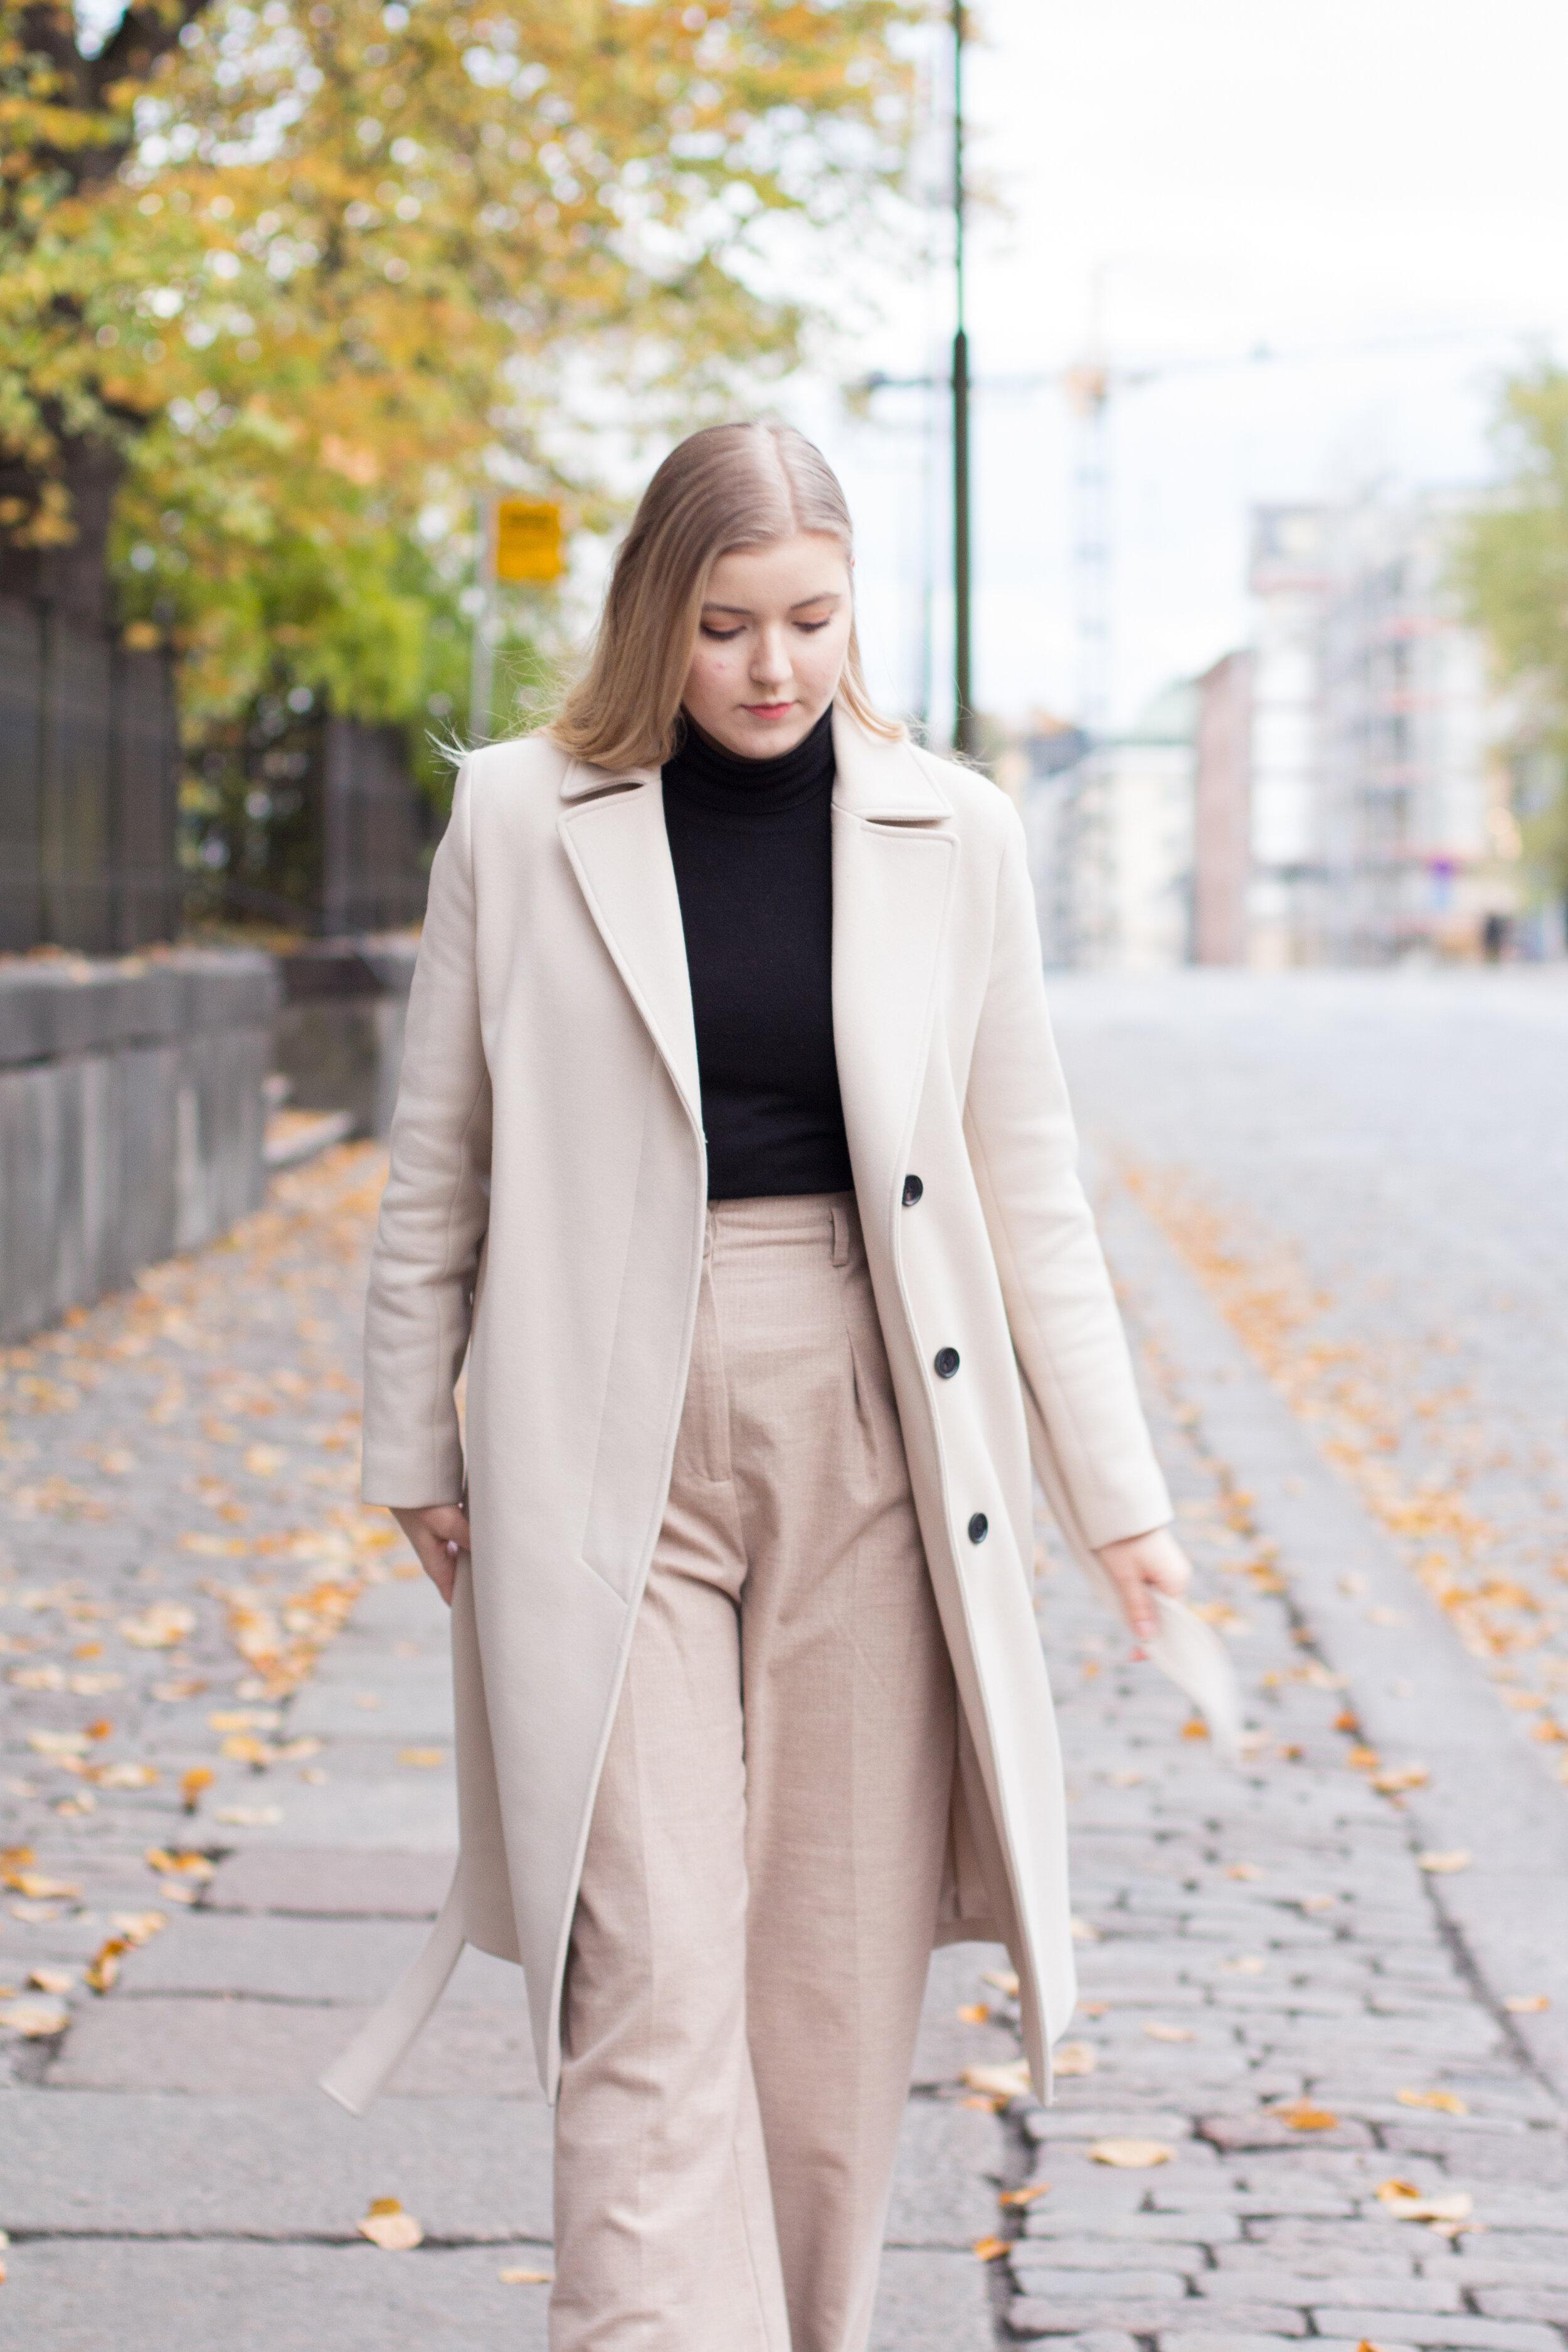 Beige coat outfit girl photo.jpg